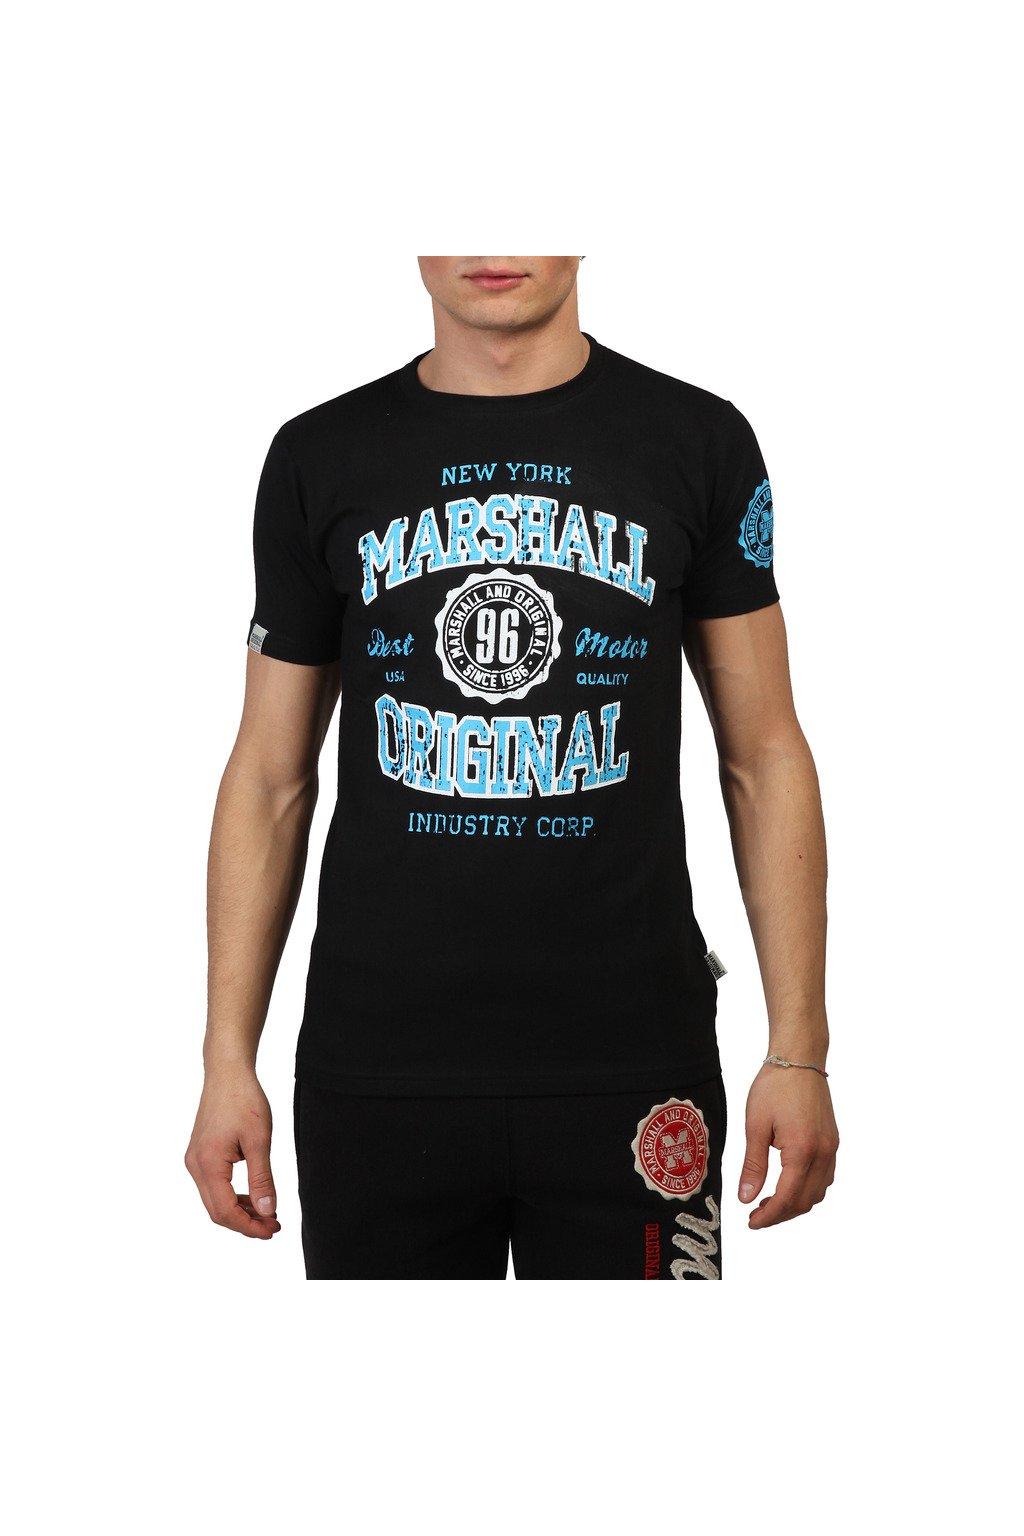 9ad2560710cf Pánske tričko Marshall Original čierne